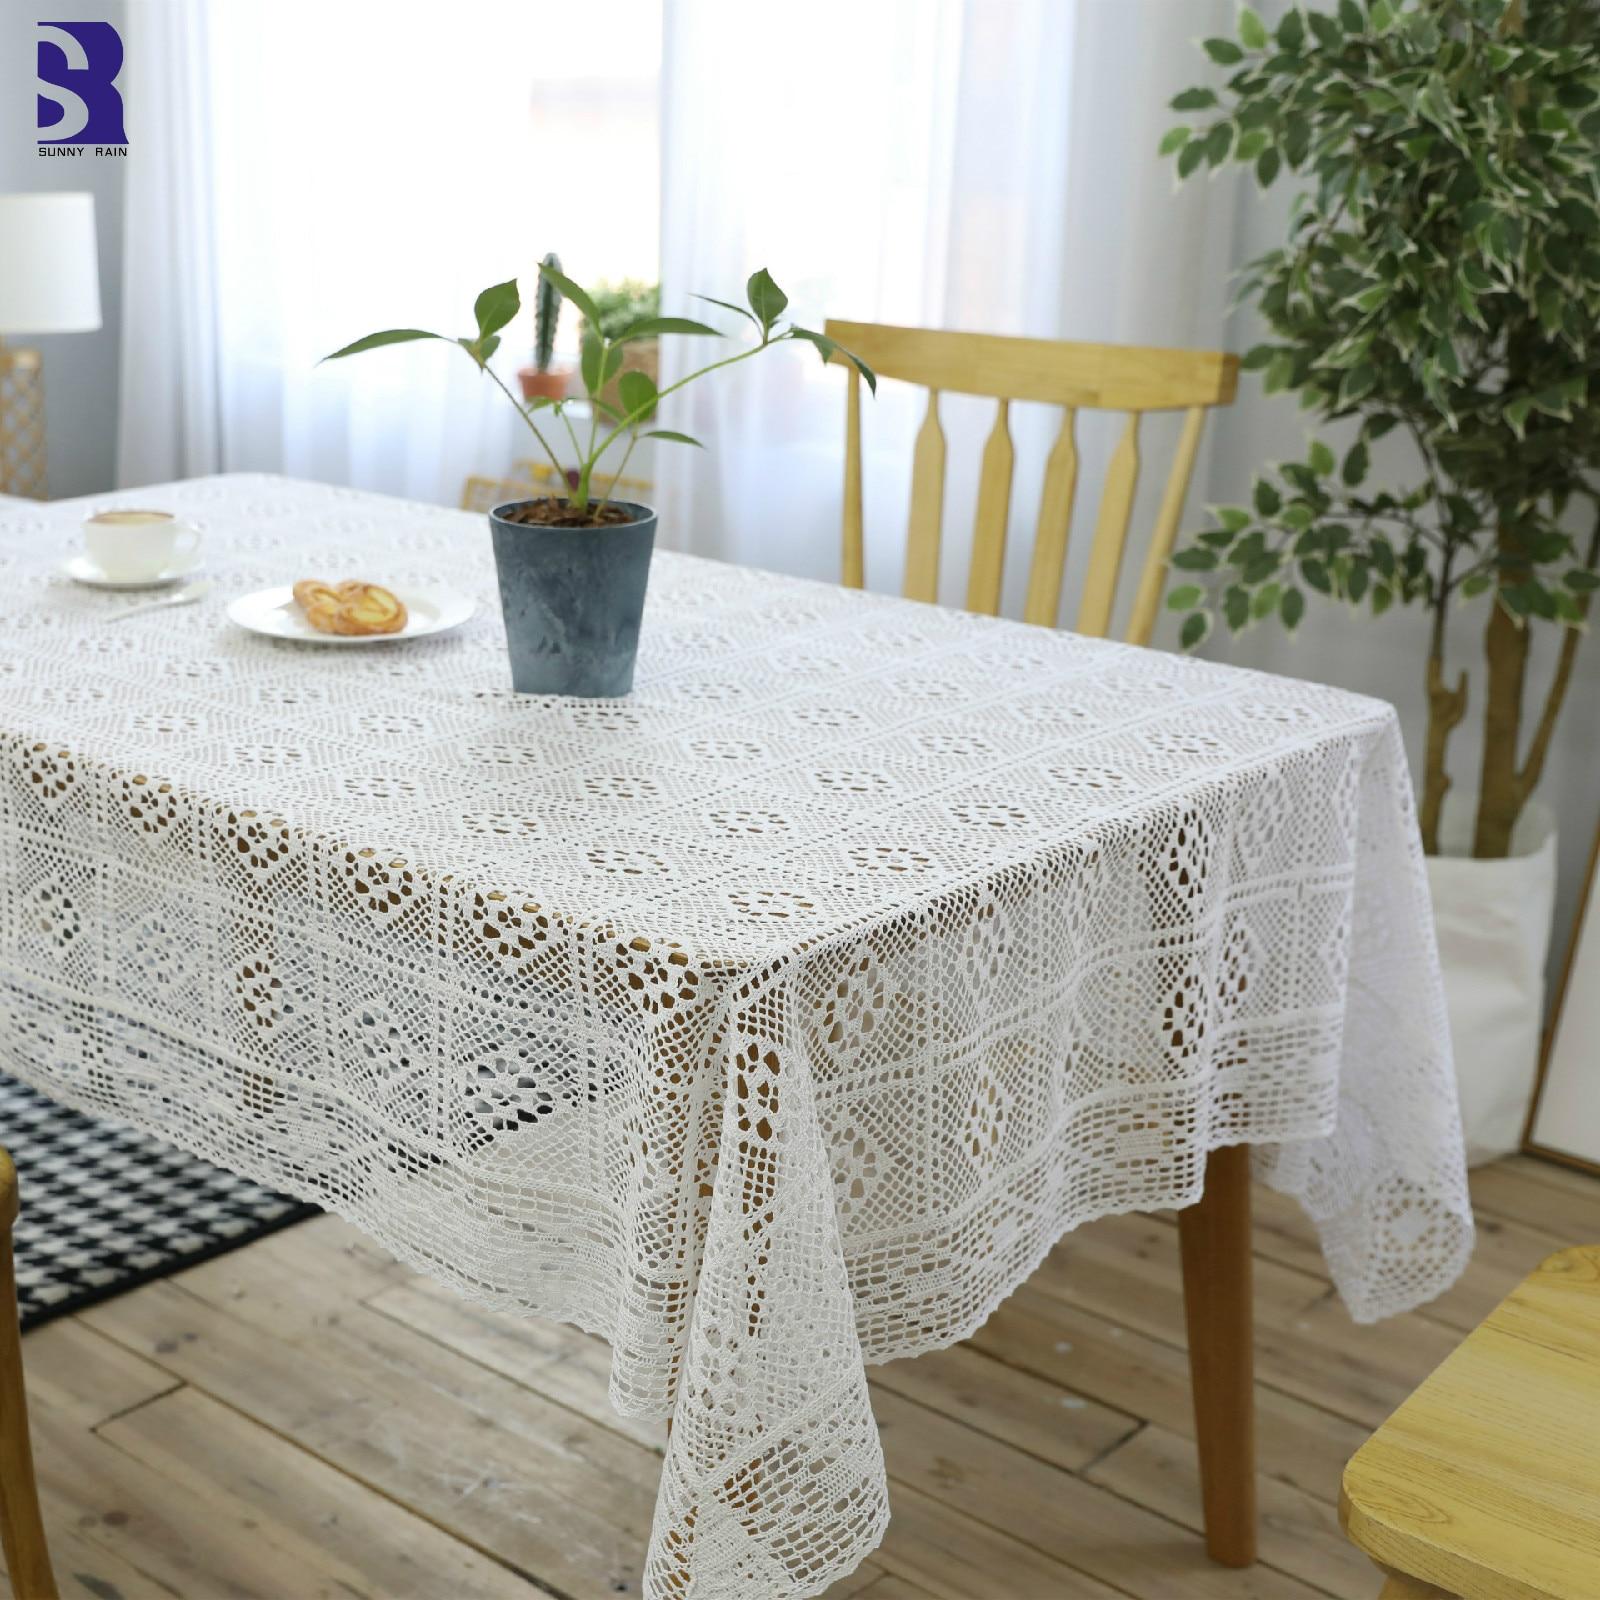 SunnyRain 1 Piece White Crochet Table Cover Christmas ...